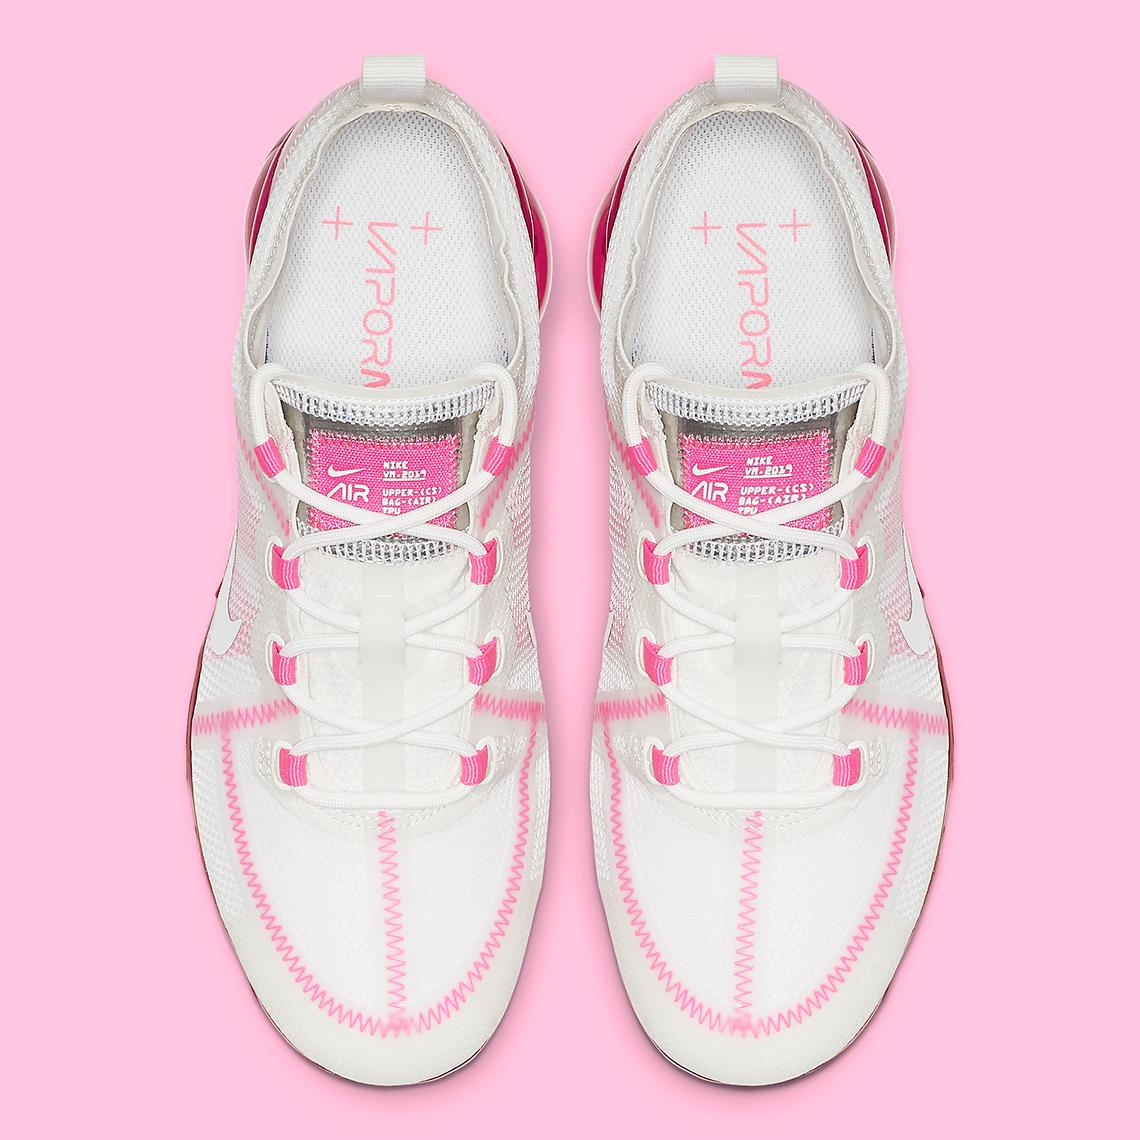 ee3e2bbe9a03c Nike Vapormax 2019 Women s White Pink AR6632-105